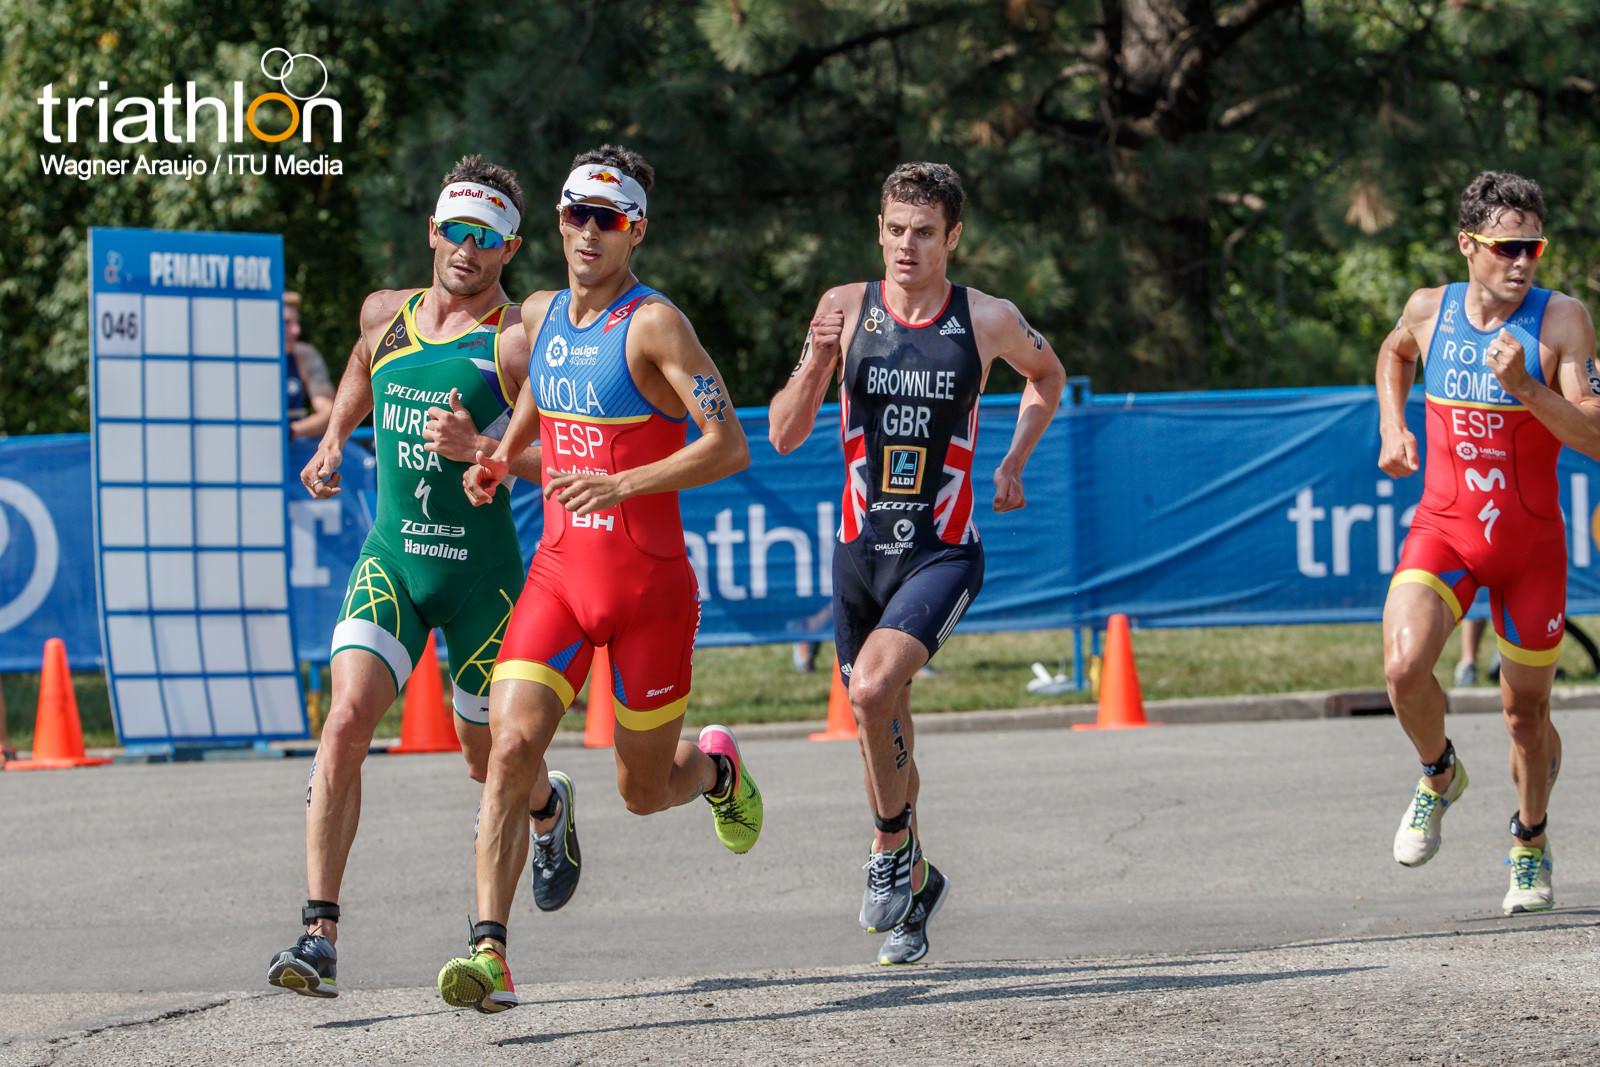 WTS Edmonton mężczyźni bieg.jpg